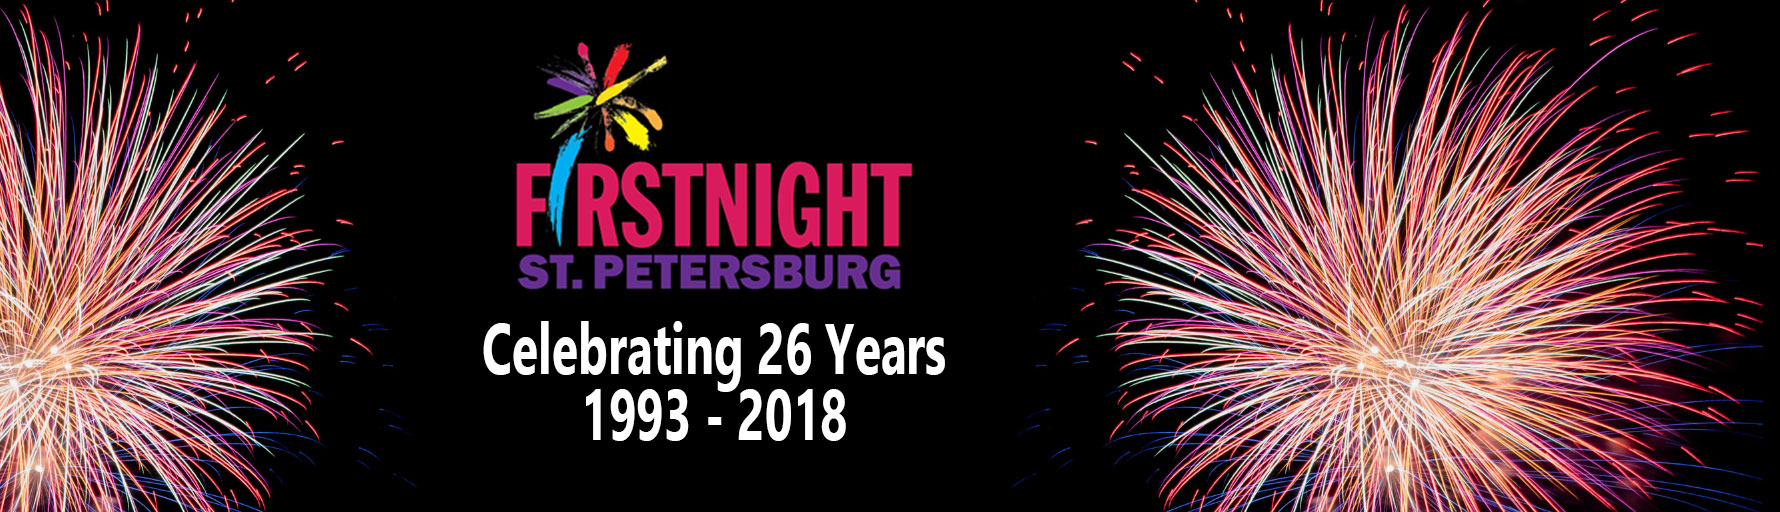 New Year 2019 in St. Petersburg 64